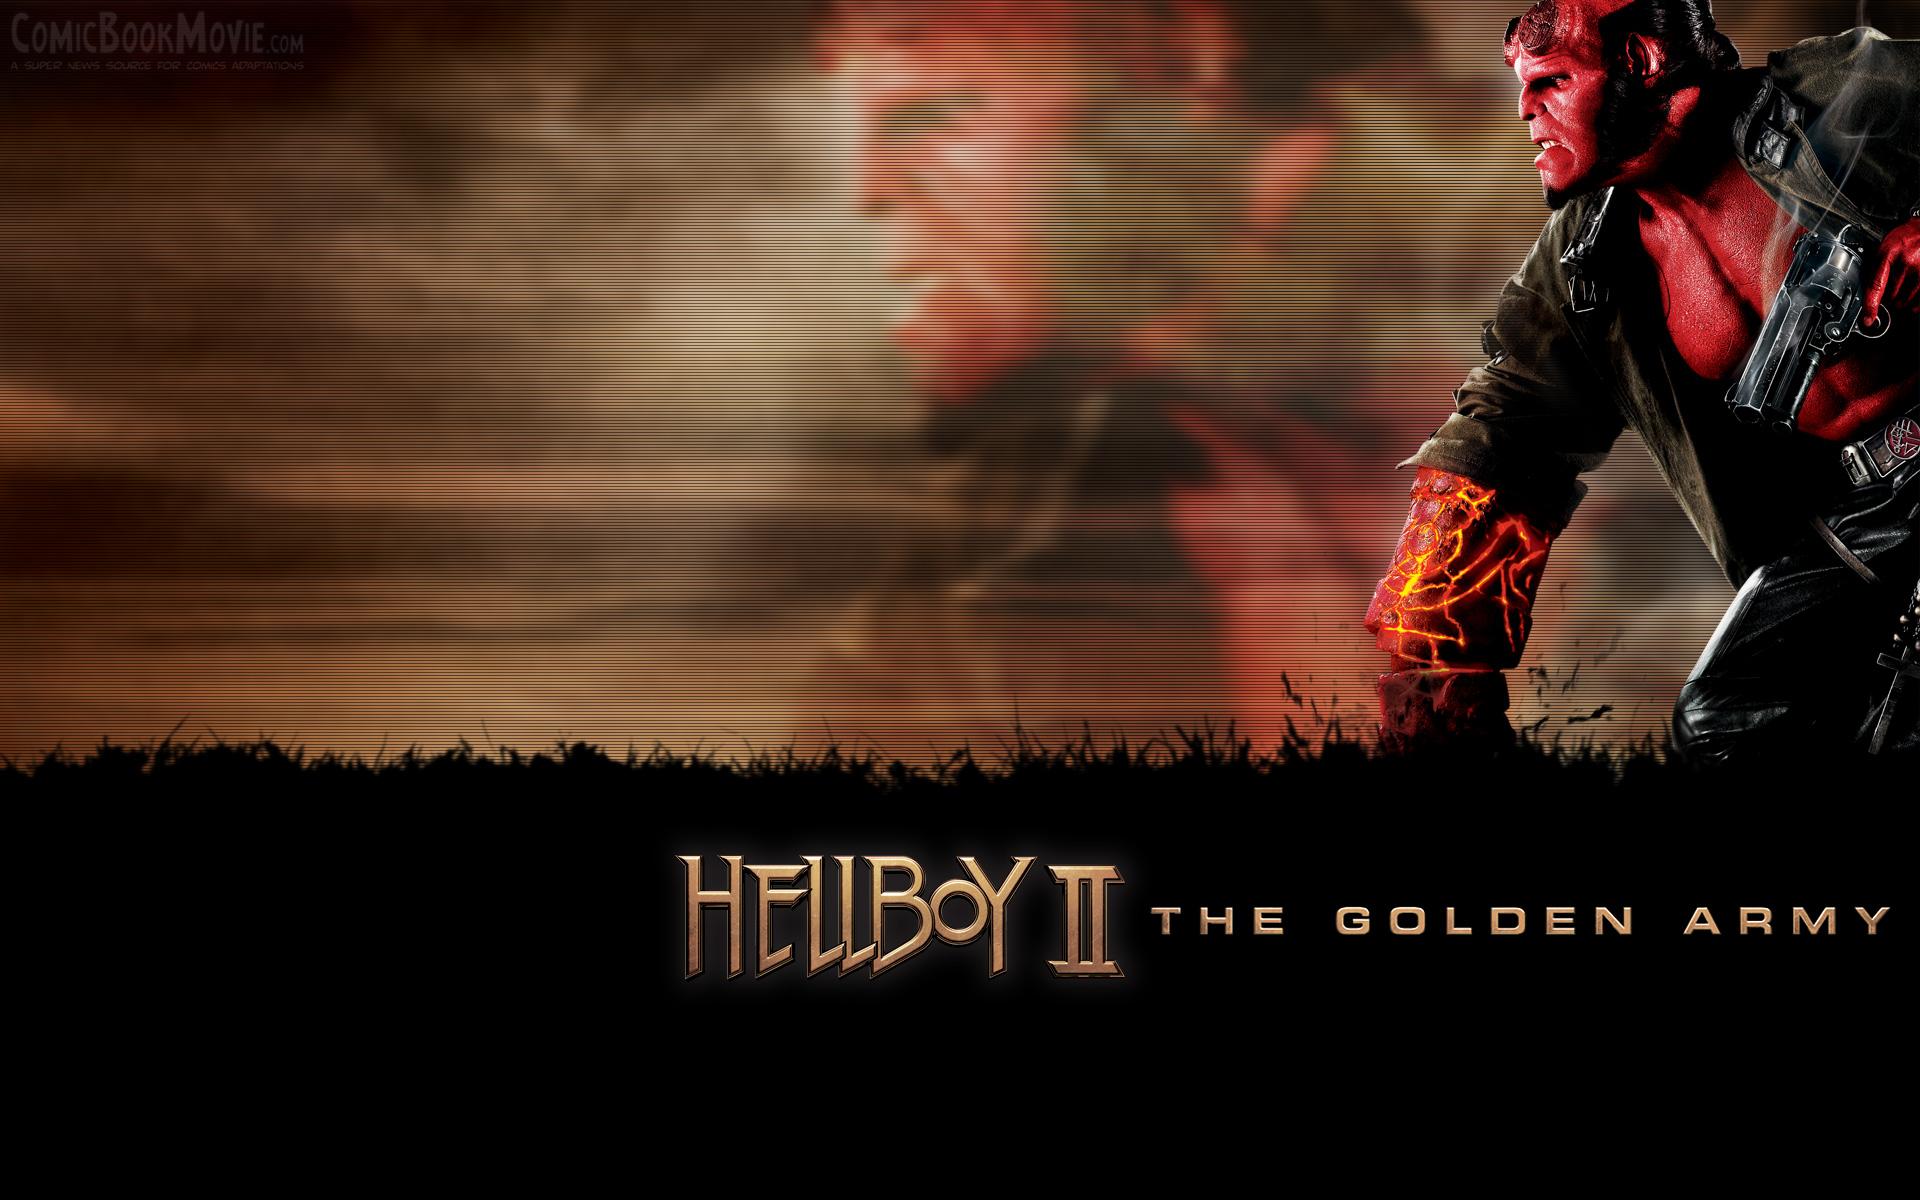 hellboy wallpaper 14388